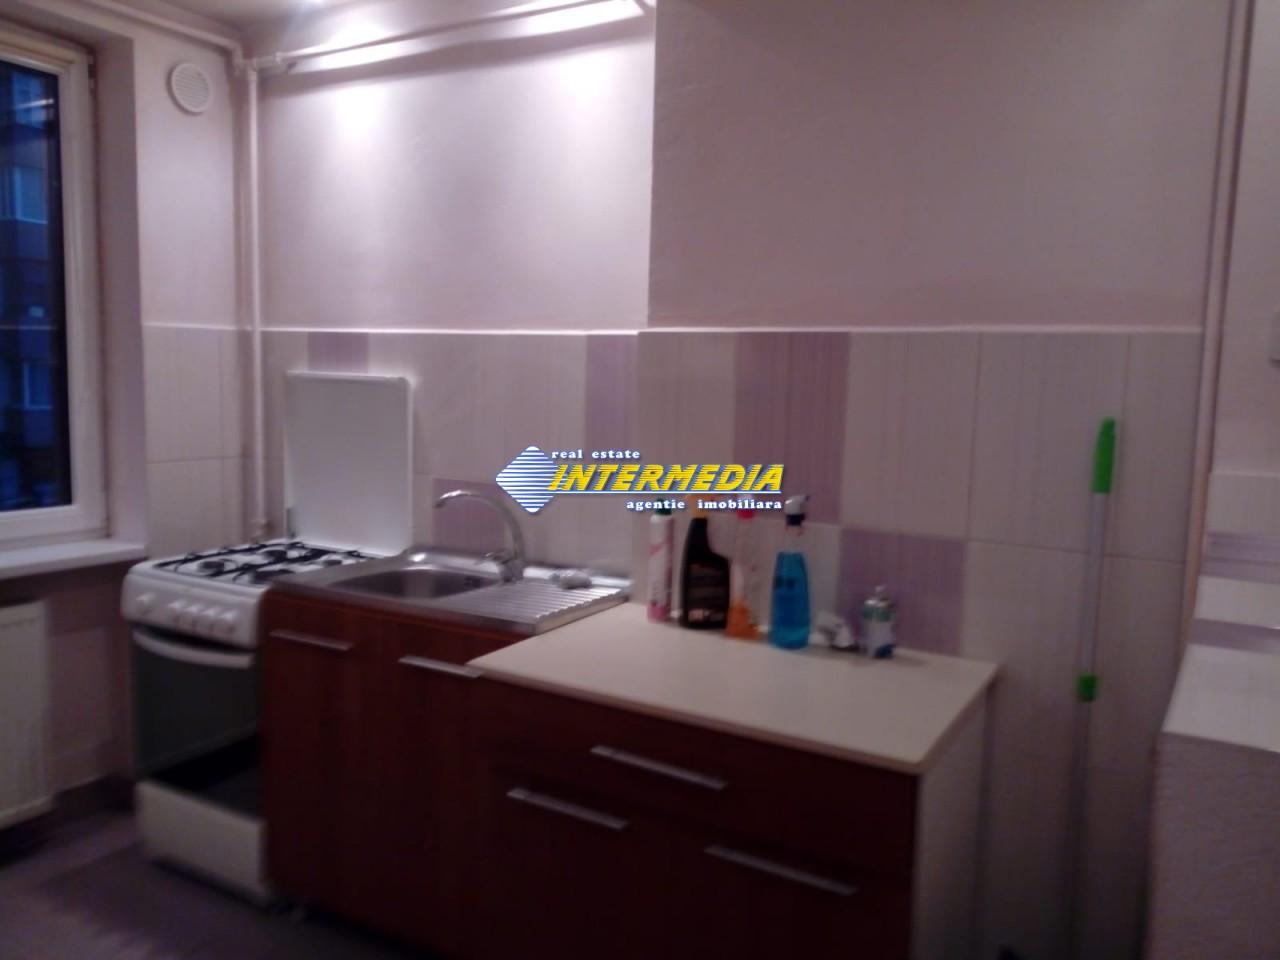 Apartament 2 camere de inchiriat in Centru Alba Iulia 250 Euro (3)_(1).jpeg